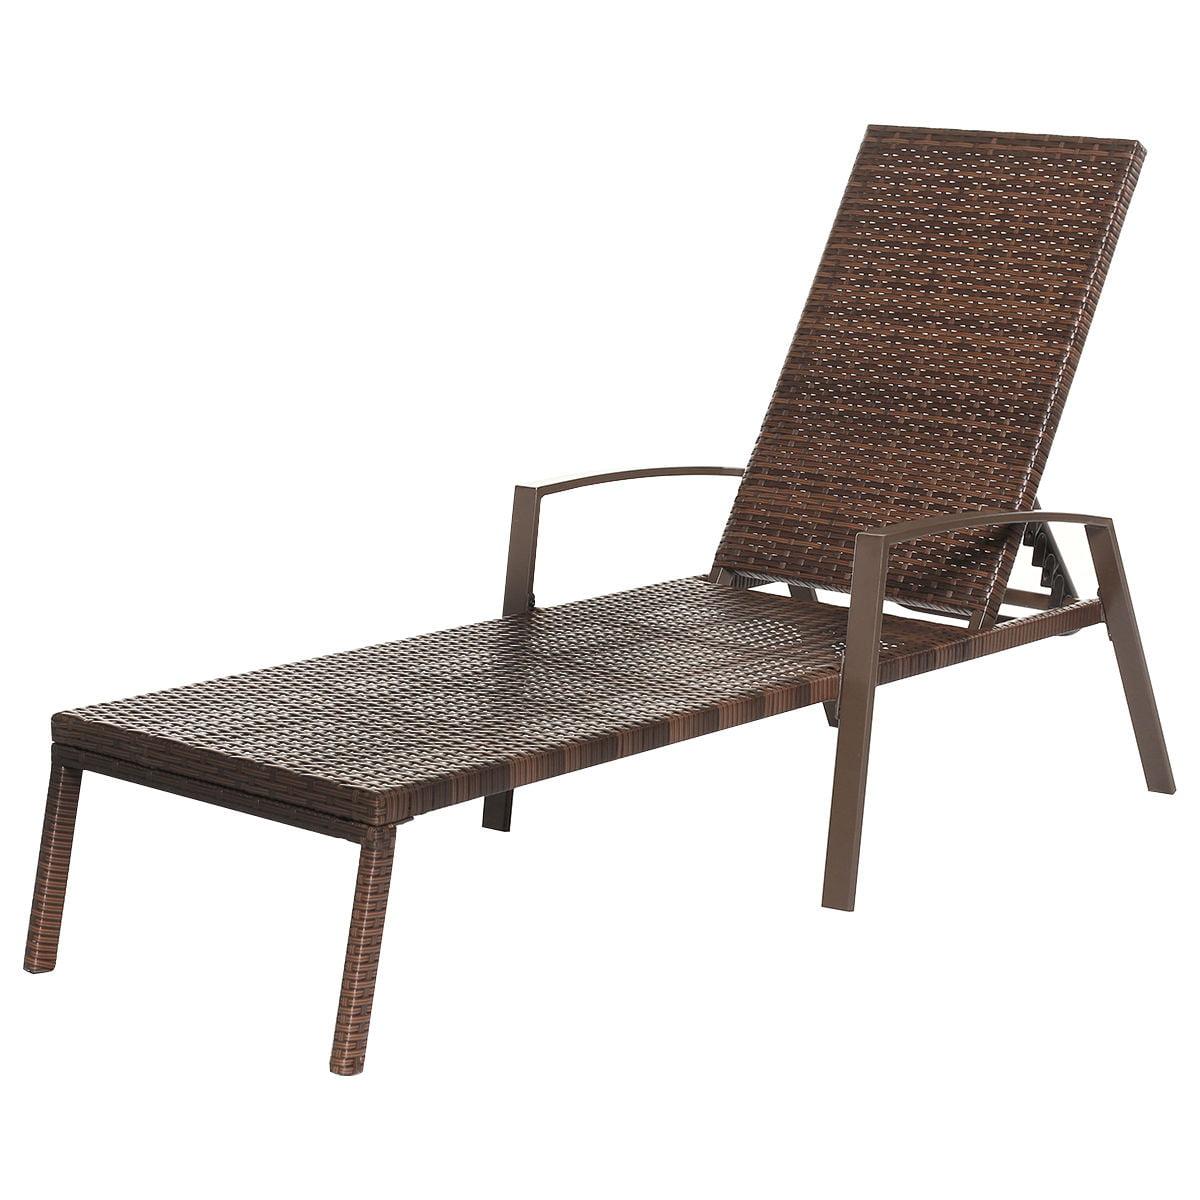 2pcs Patio Rattan Lounge Chair Garden Furniture Adjustable Back W/ Cushion - image 5 of 10